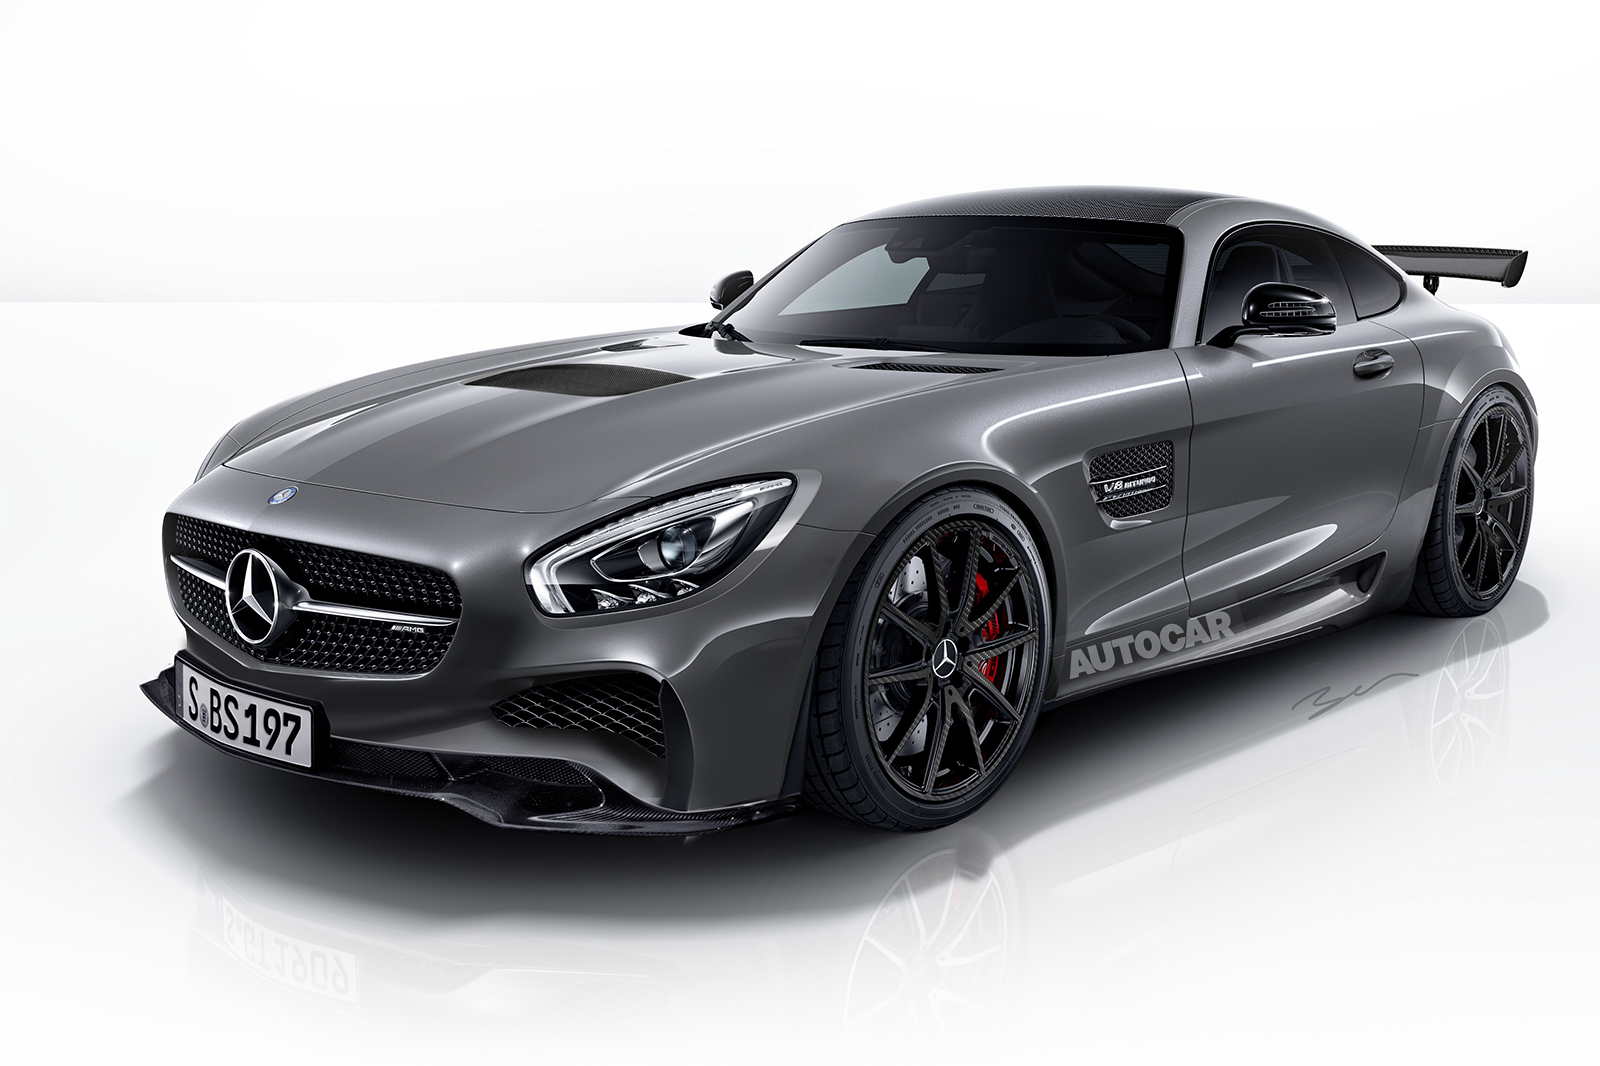 600bhp Mercedes-AMG C-Class Black Series under ...